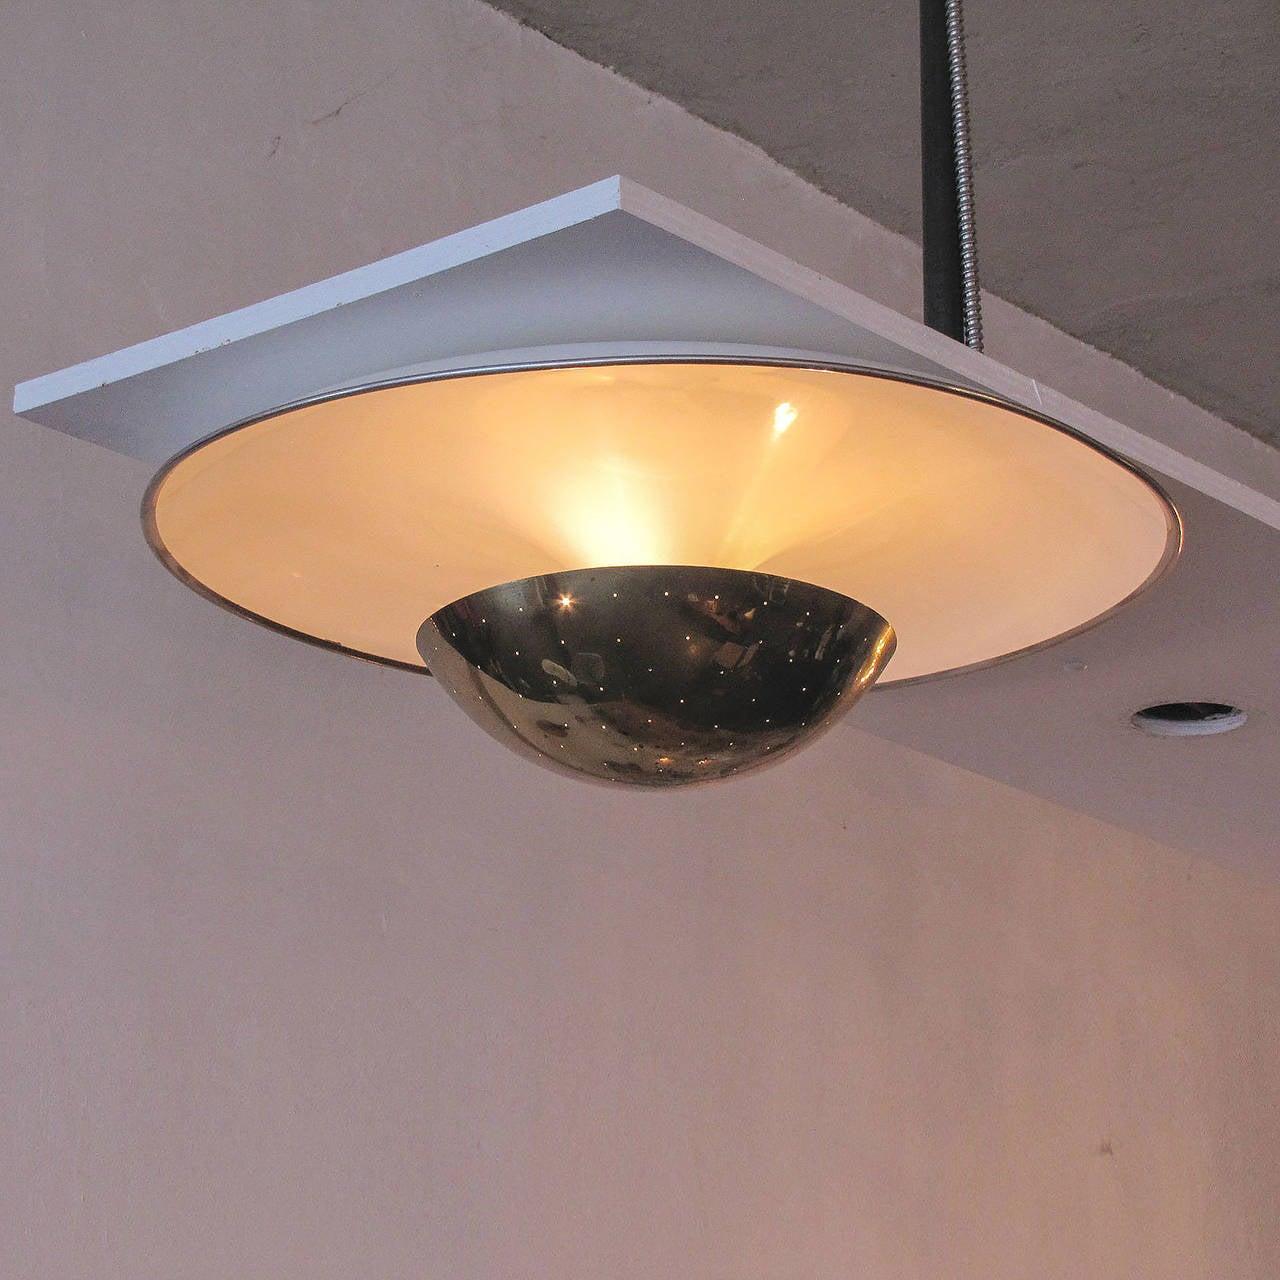 Gino Sarfatti Flush Mount Light 1